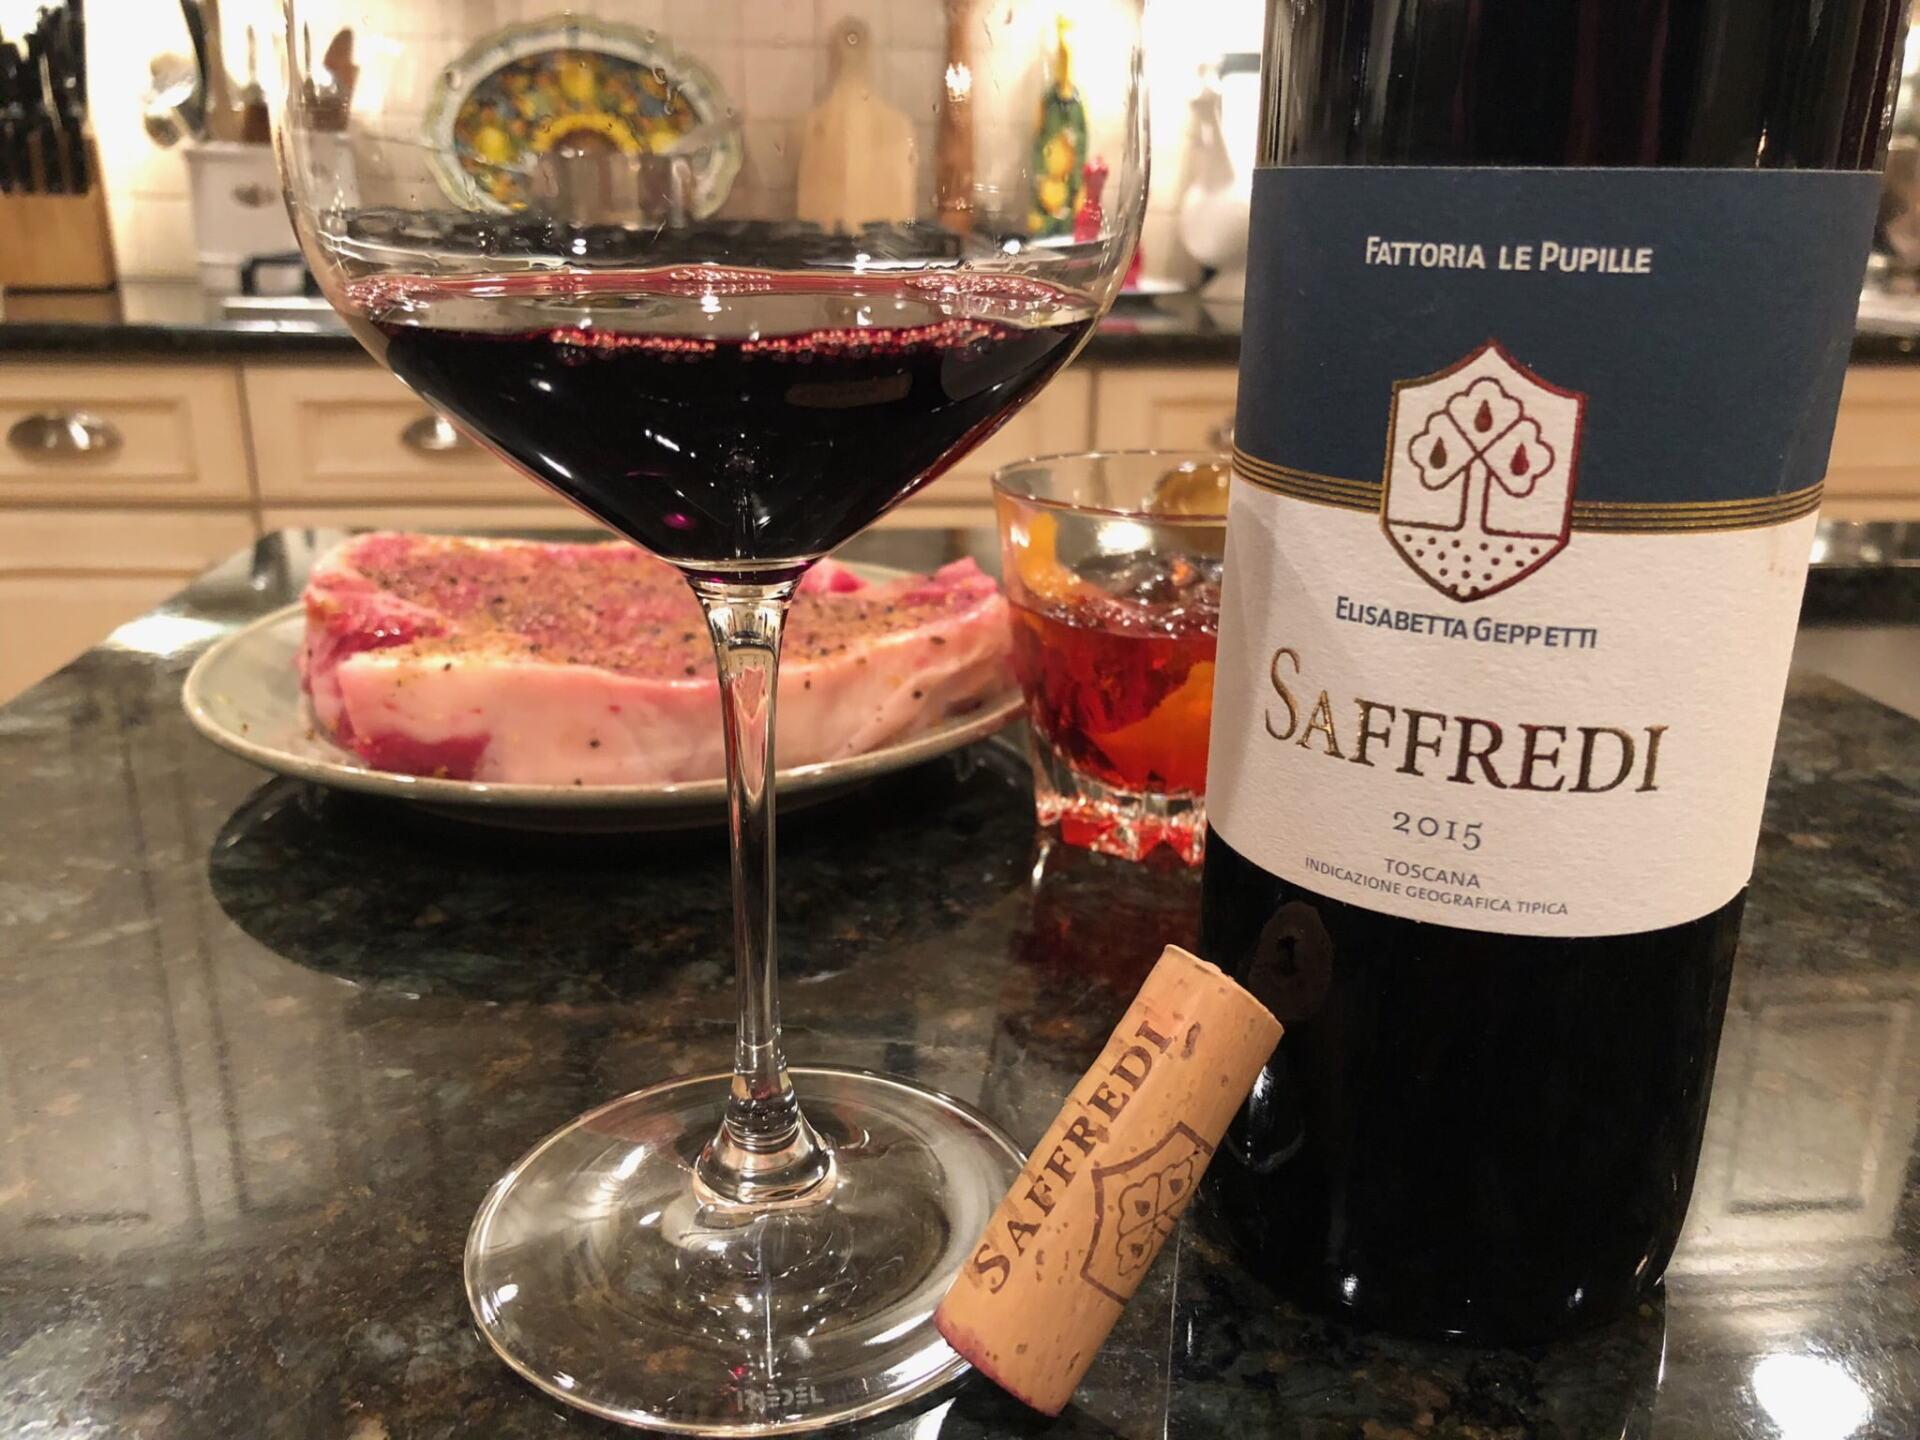 Bottle of red Tuscan Saffredi wine and a big steak